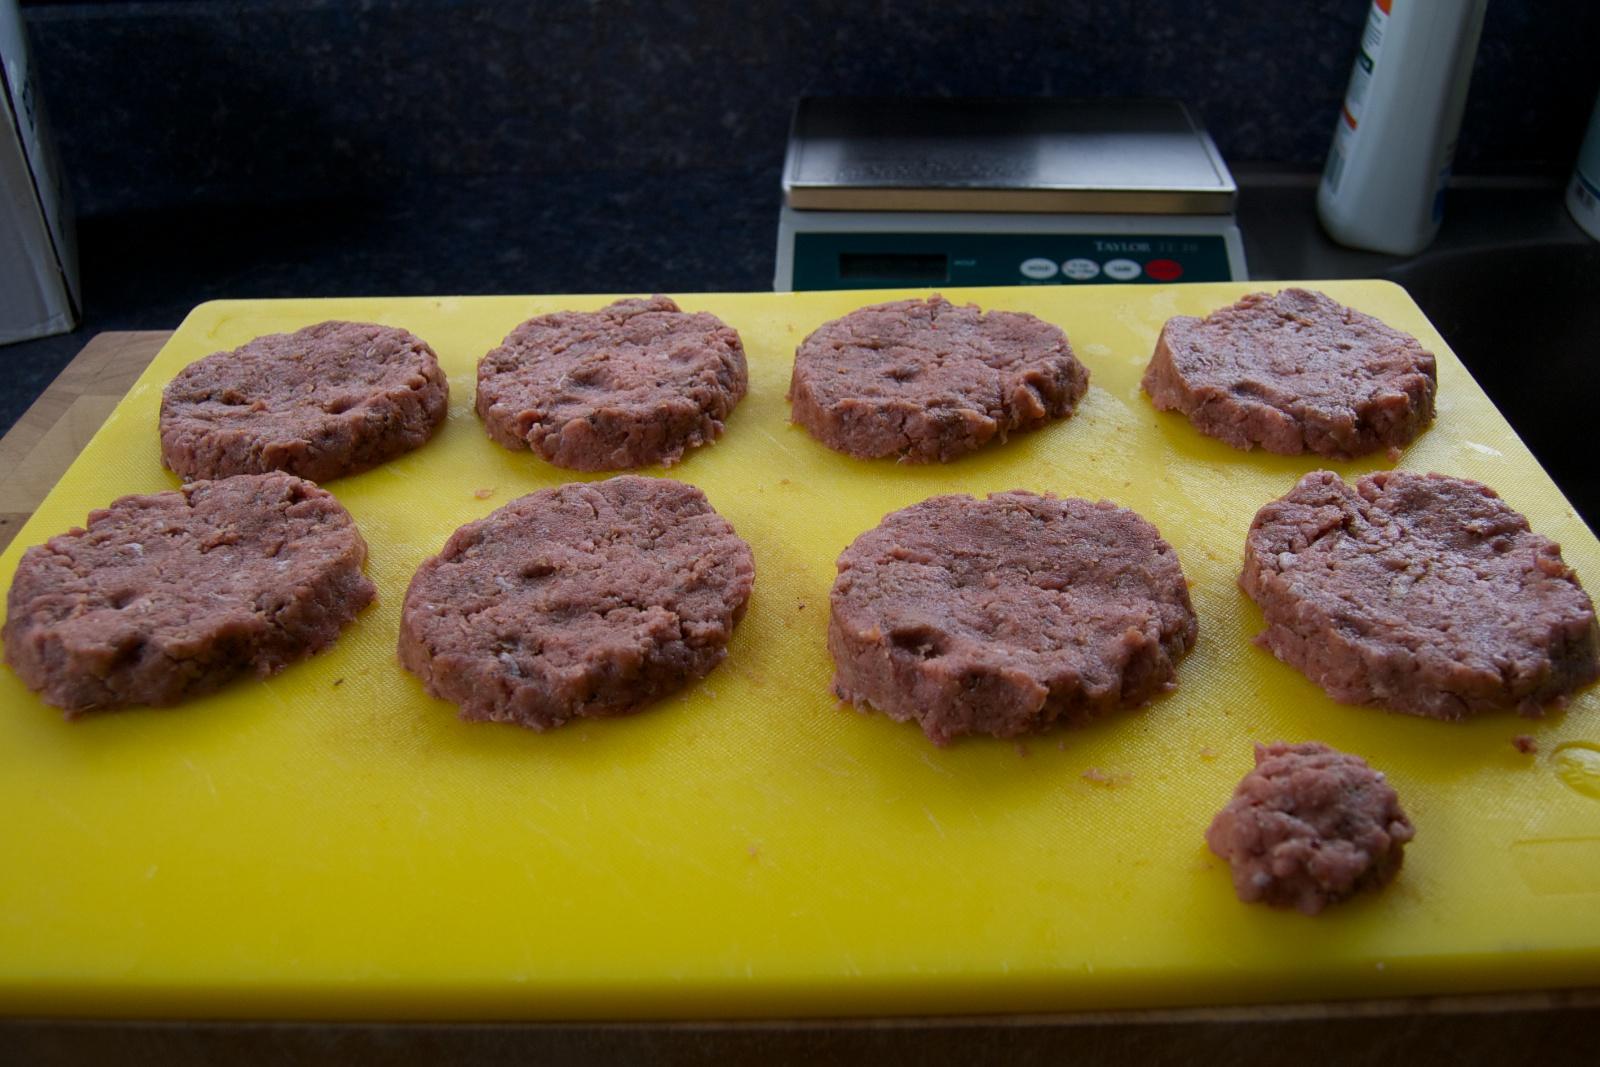 http://blog.rickk.com/food/2011/08/16/sausage2.jpg